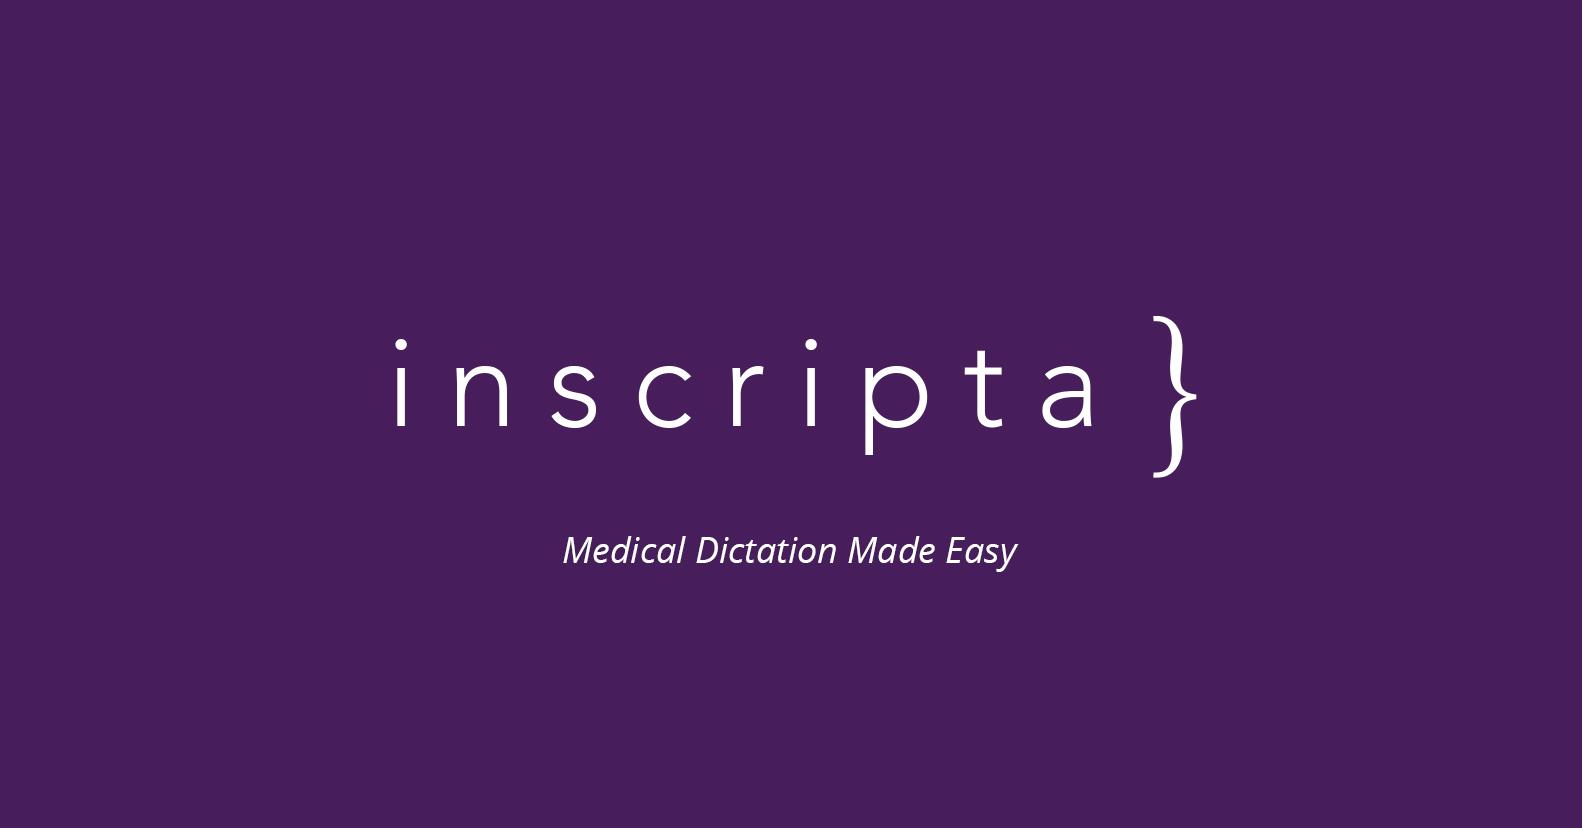 Inscripta   Dictation and Transcription Solution for demanding